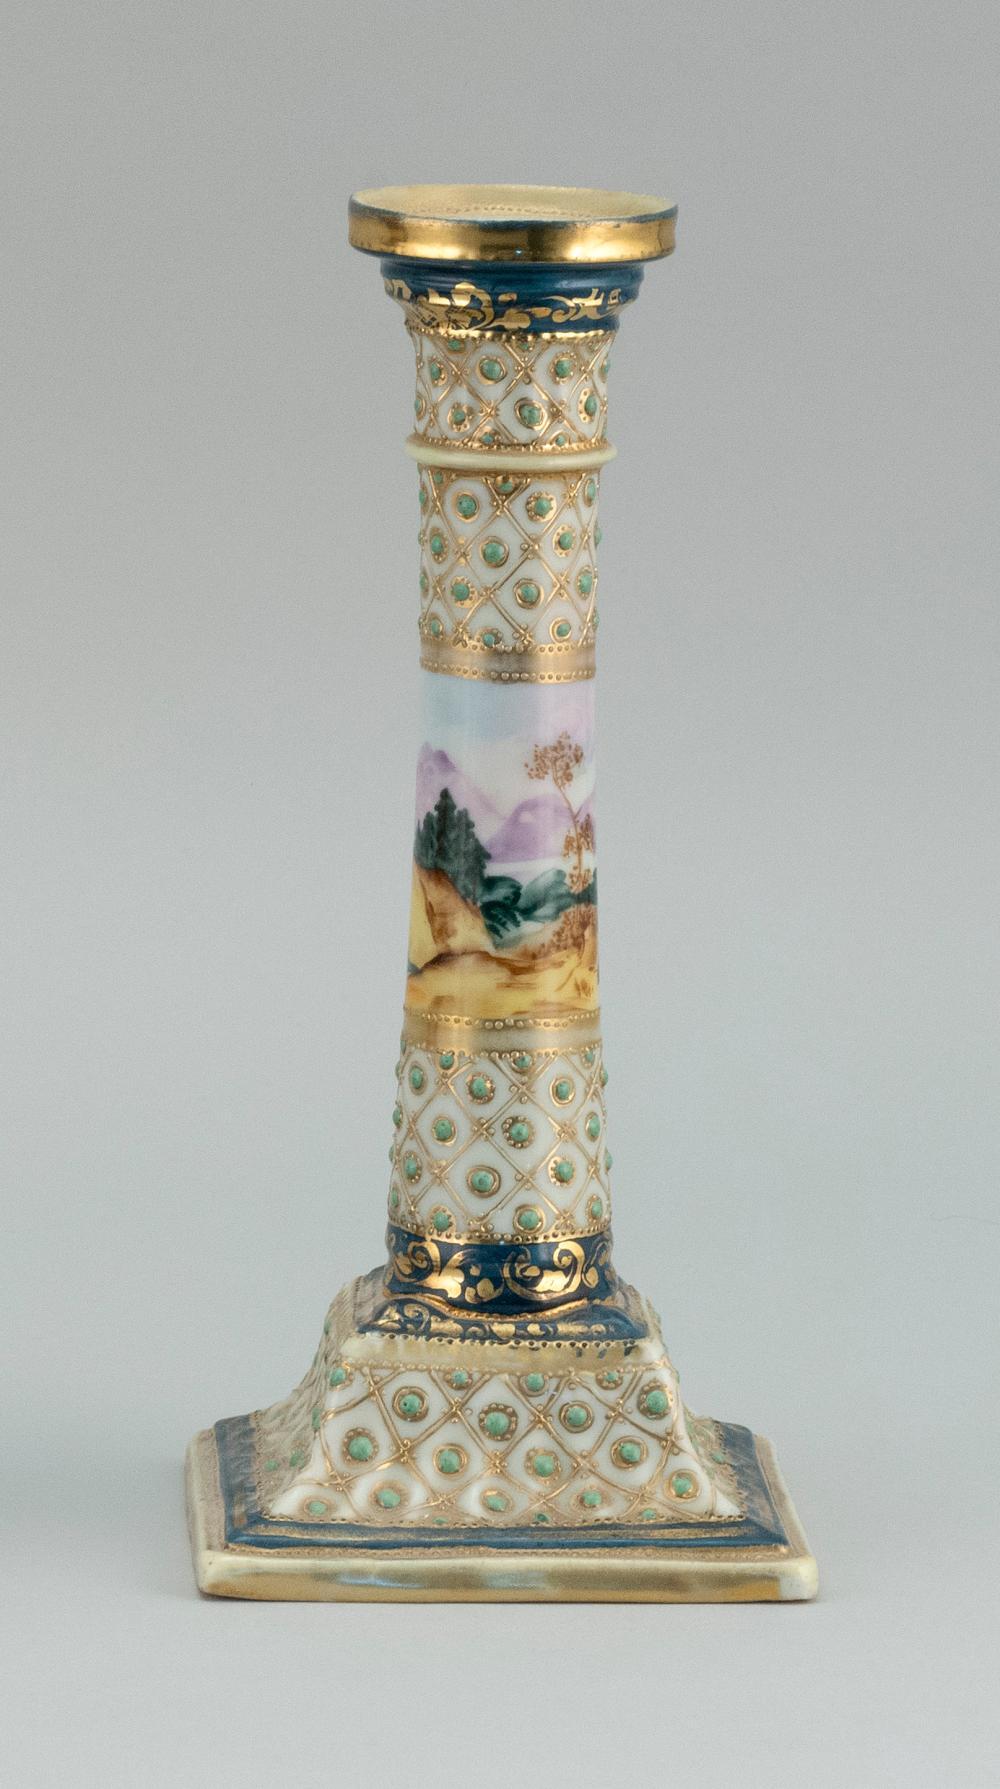 "NIPPON PORCELAIN CANDLESTICK With jeweled landscape design. Van Patten #52 mark on base. Height 9.25""."